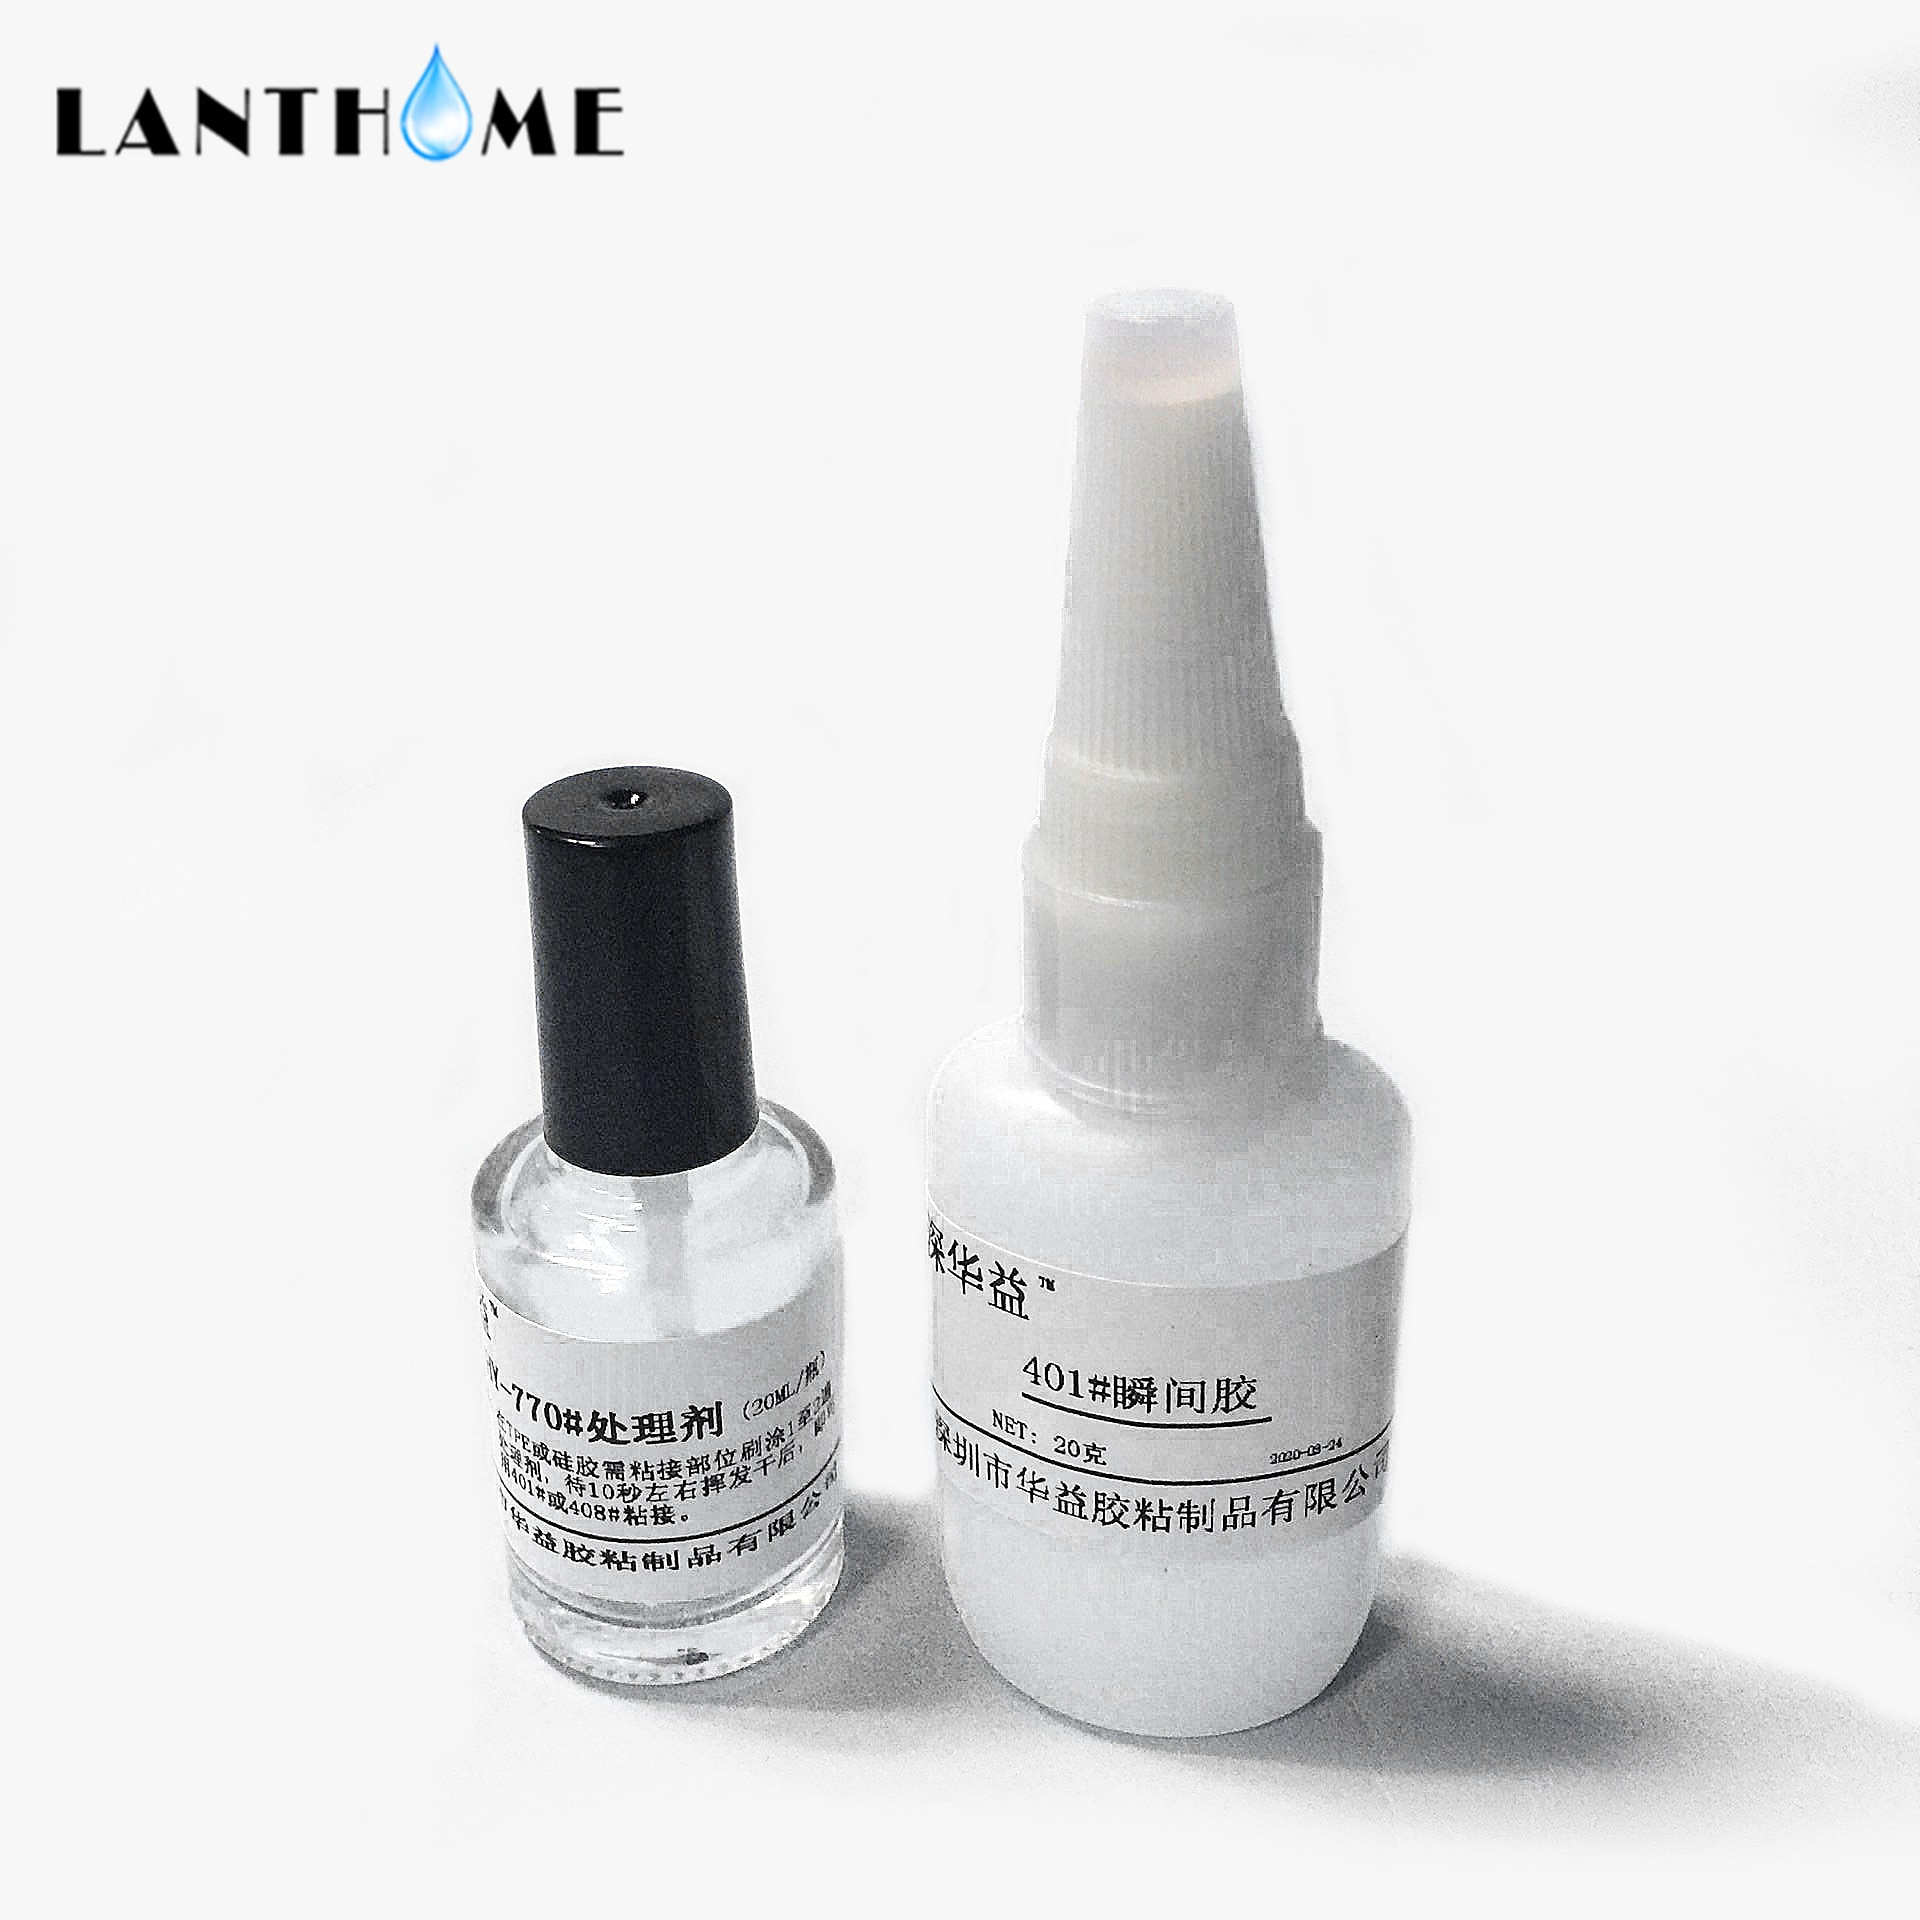 Kit de reparación de muñeca sexual TPE, pegamento para reparación de cabello Vaginal/Pestañas/pegamento para uñas + agente de tratamiento, Kit de mantenimiento de muñeca sexual de silicona